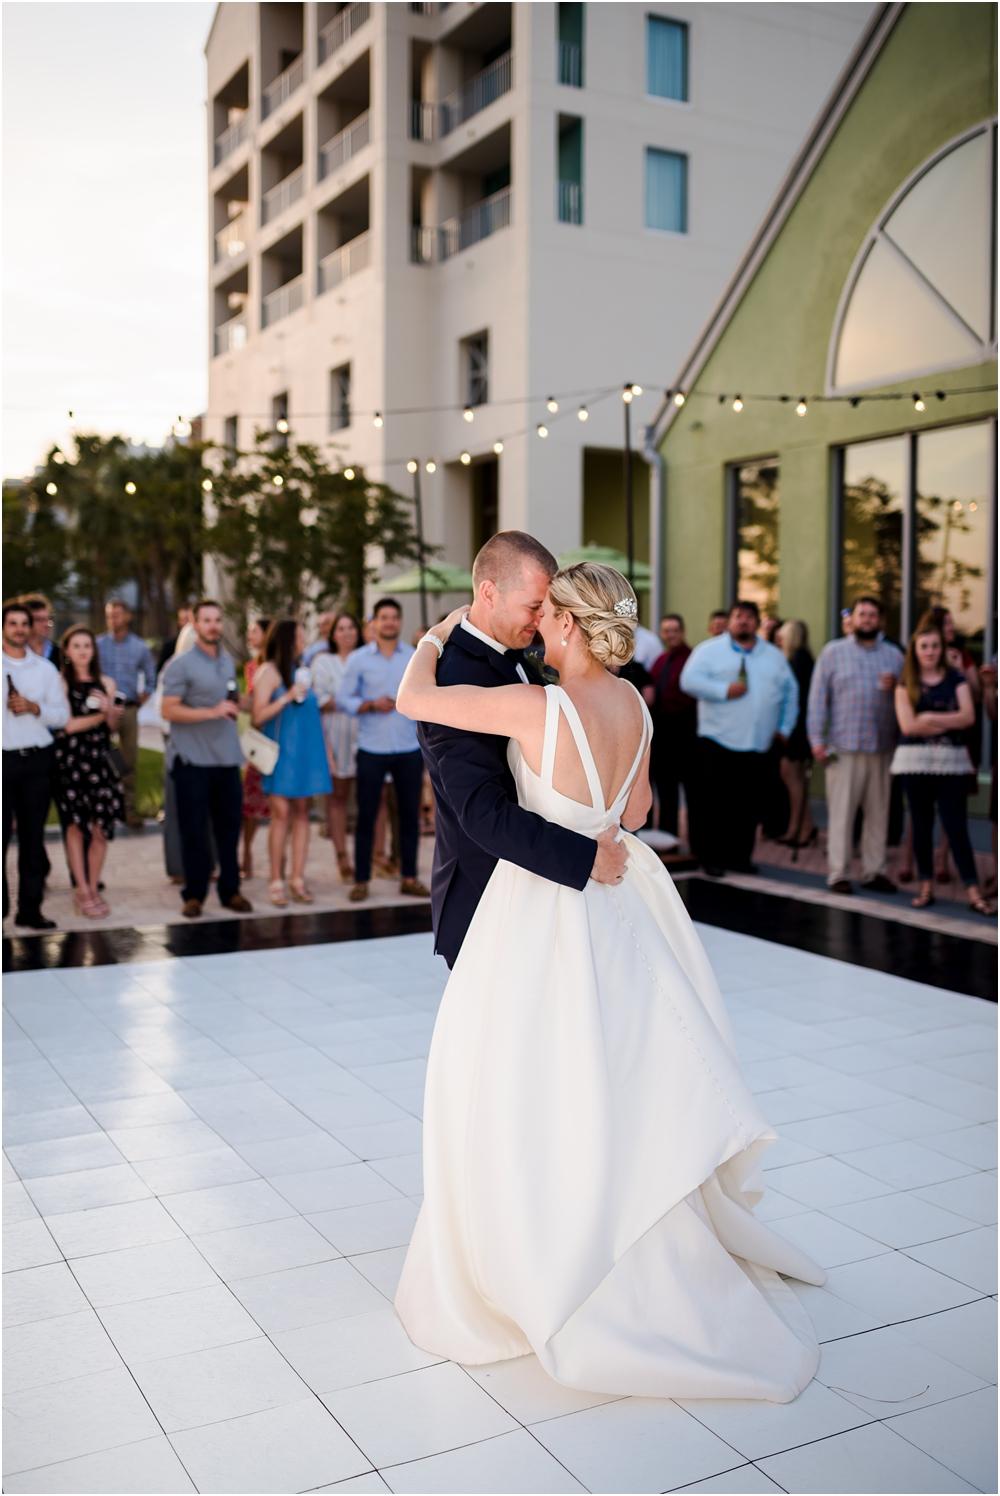 wilkins-sheraton-panama-city-beach-florida-wedding-dothan-tallahassee-kiersten-stevenson-photography-146.jpg